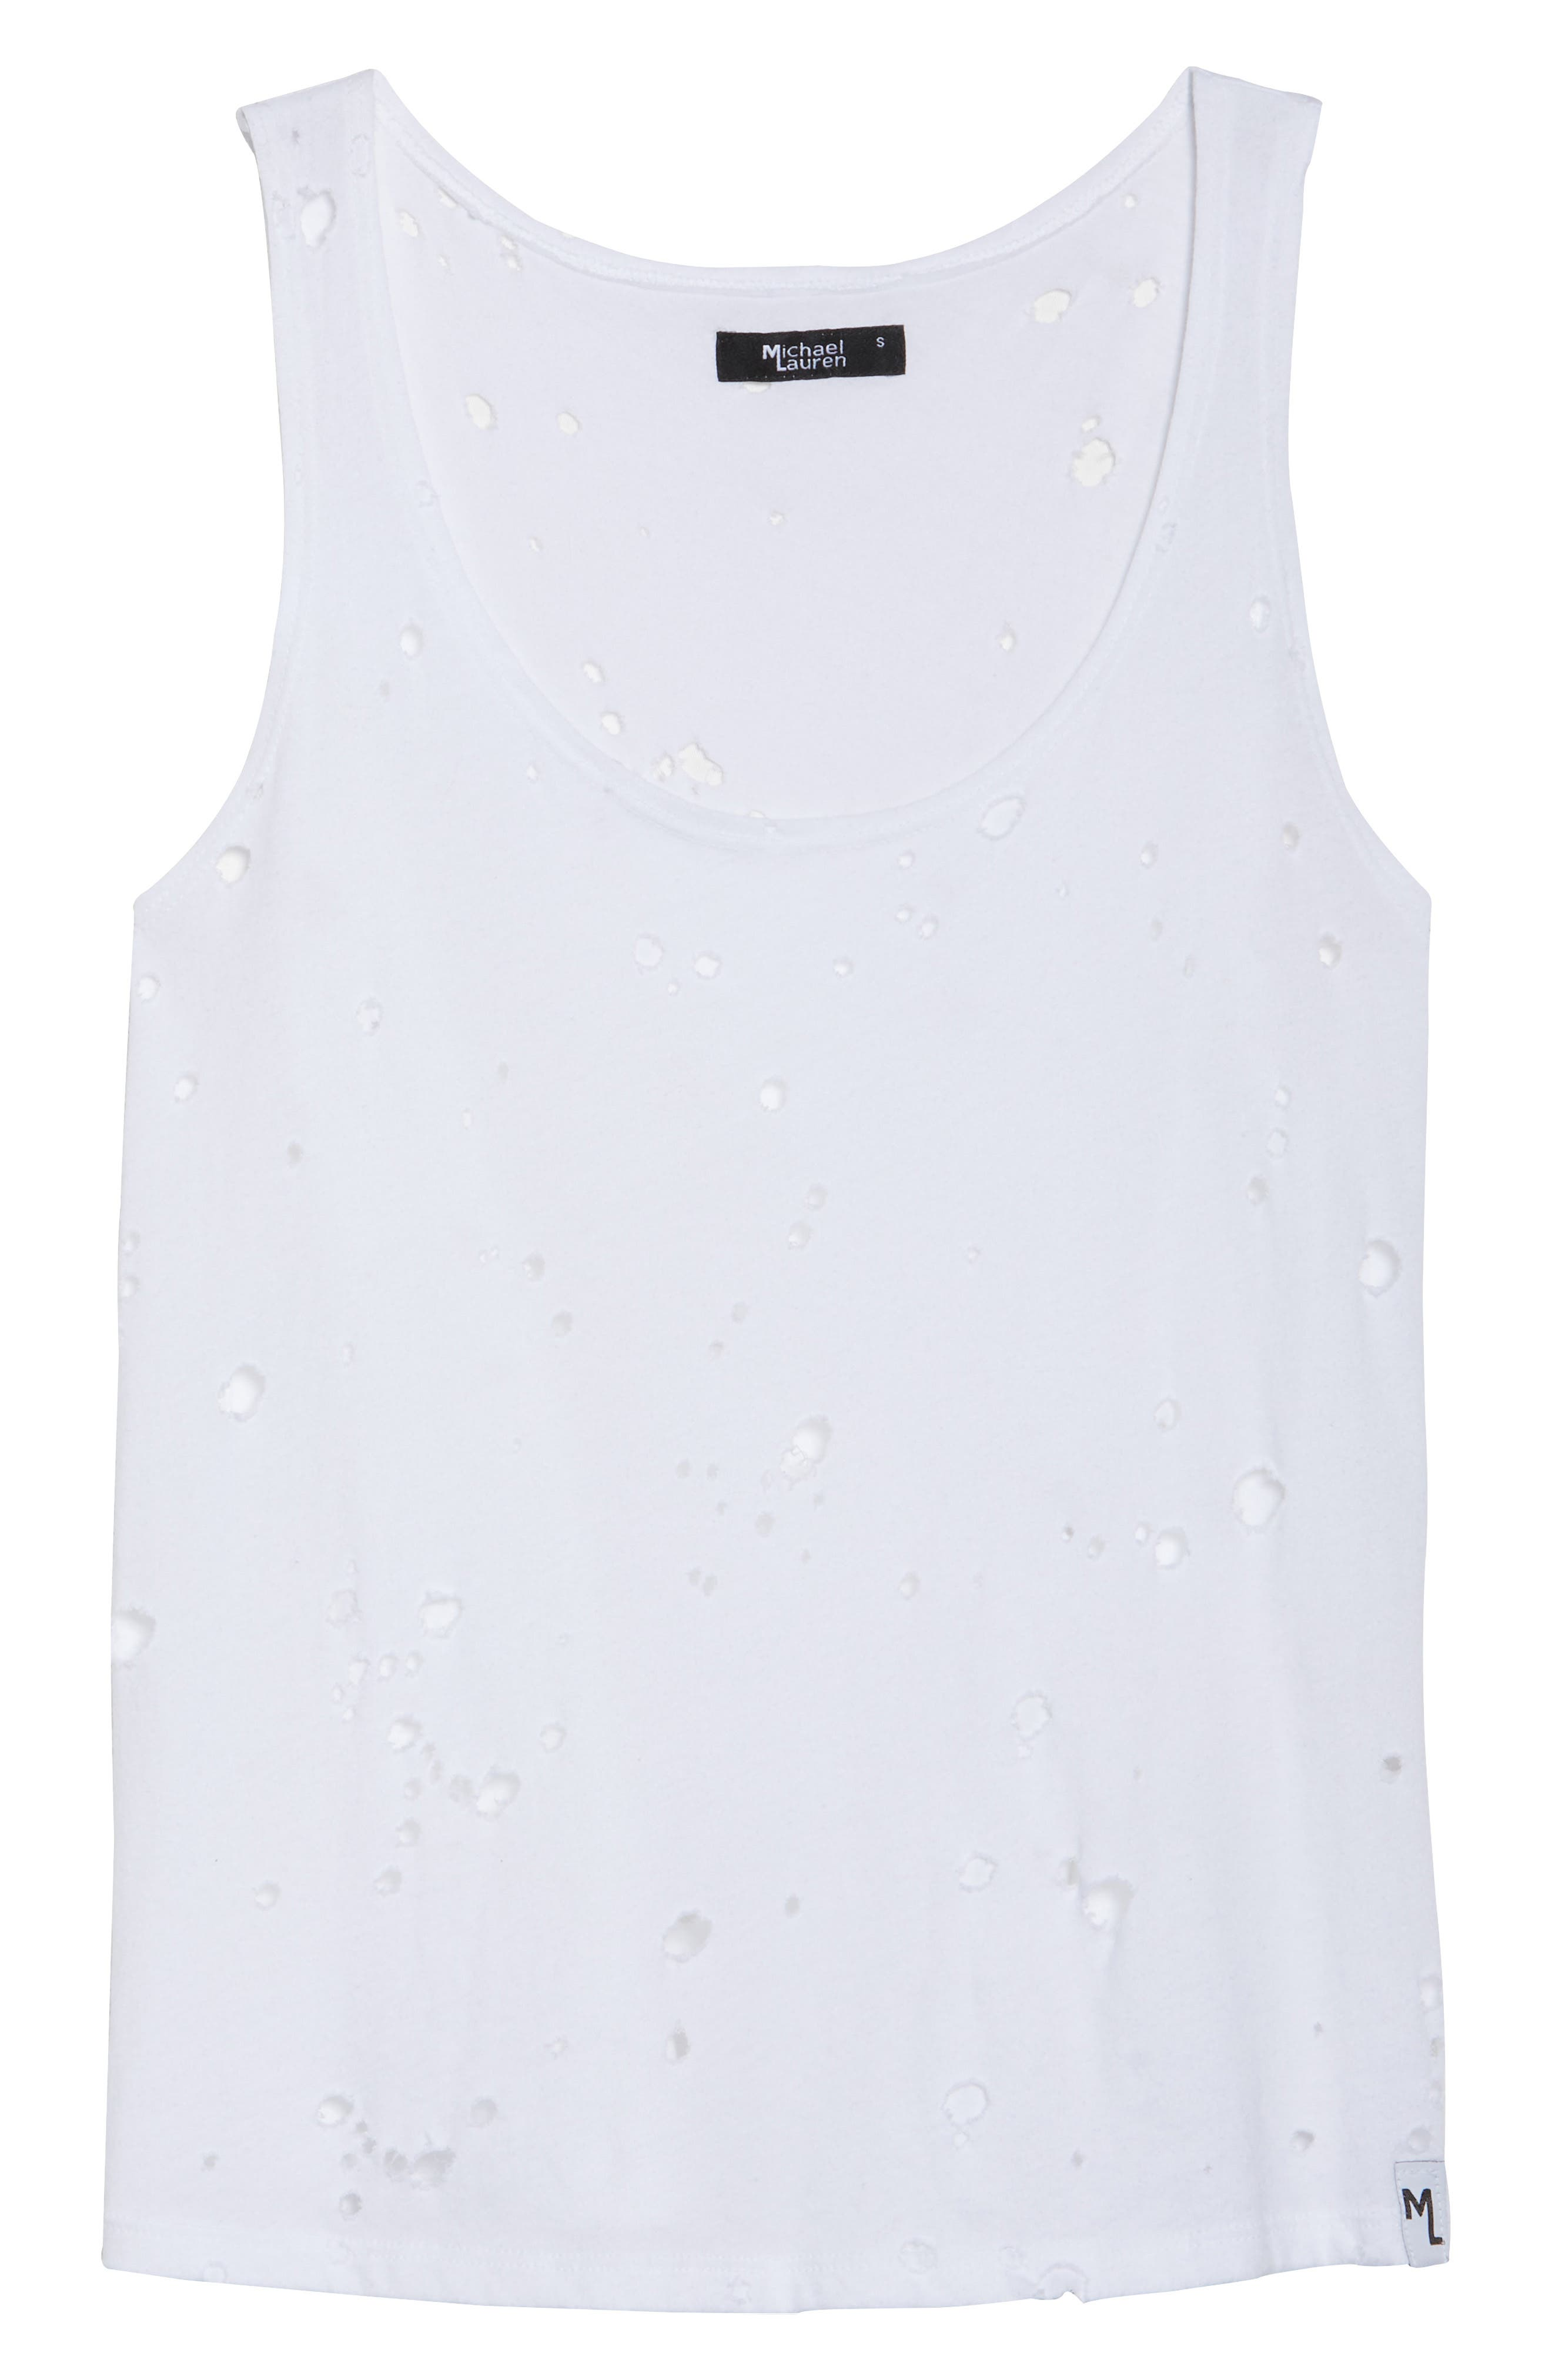 Brock Distressed Lounge Tank,                             Alternate thumbnail 6, color,                             White